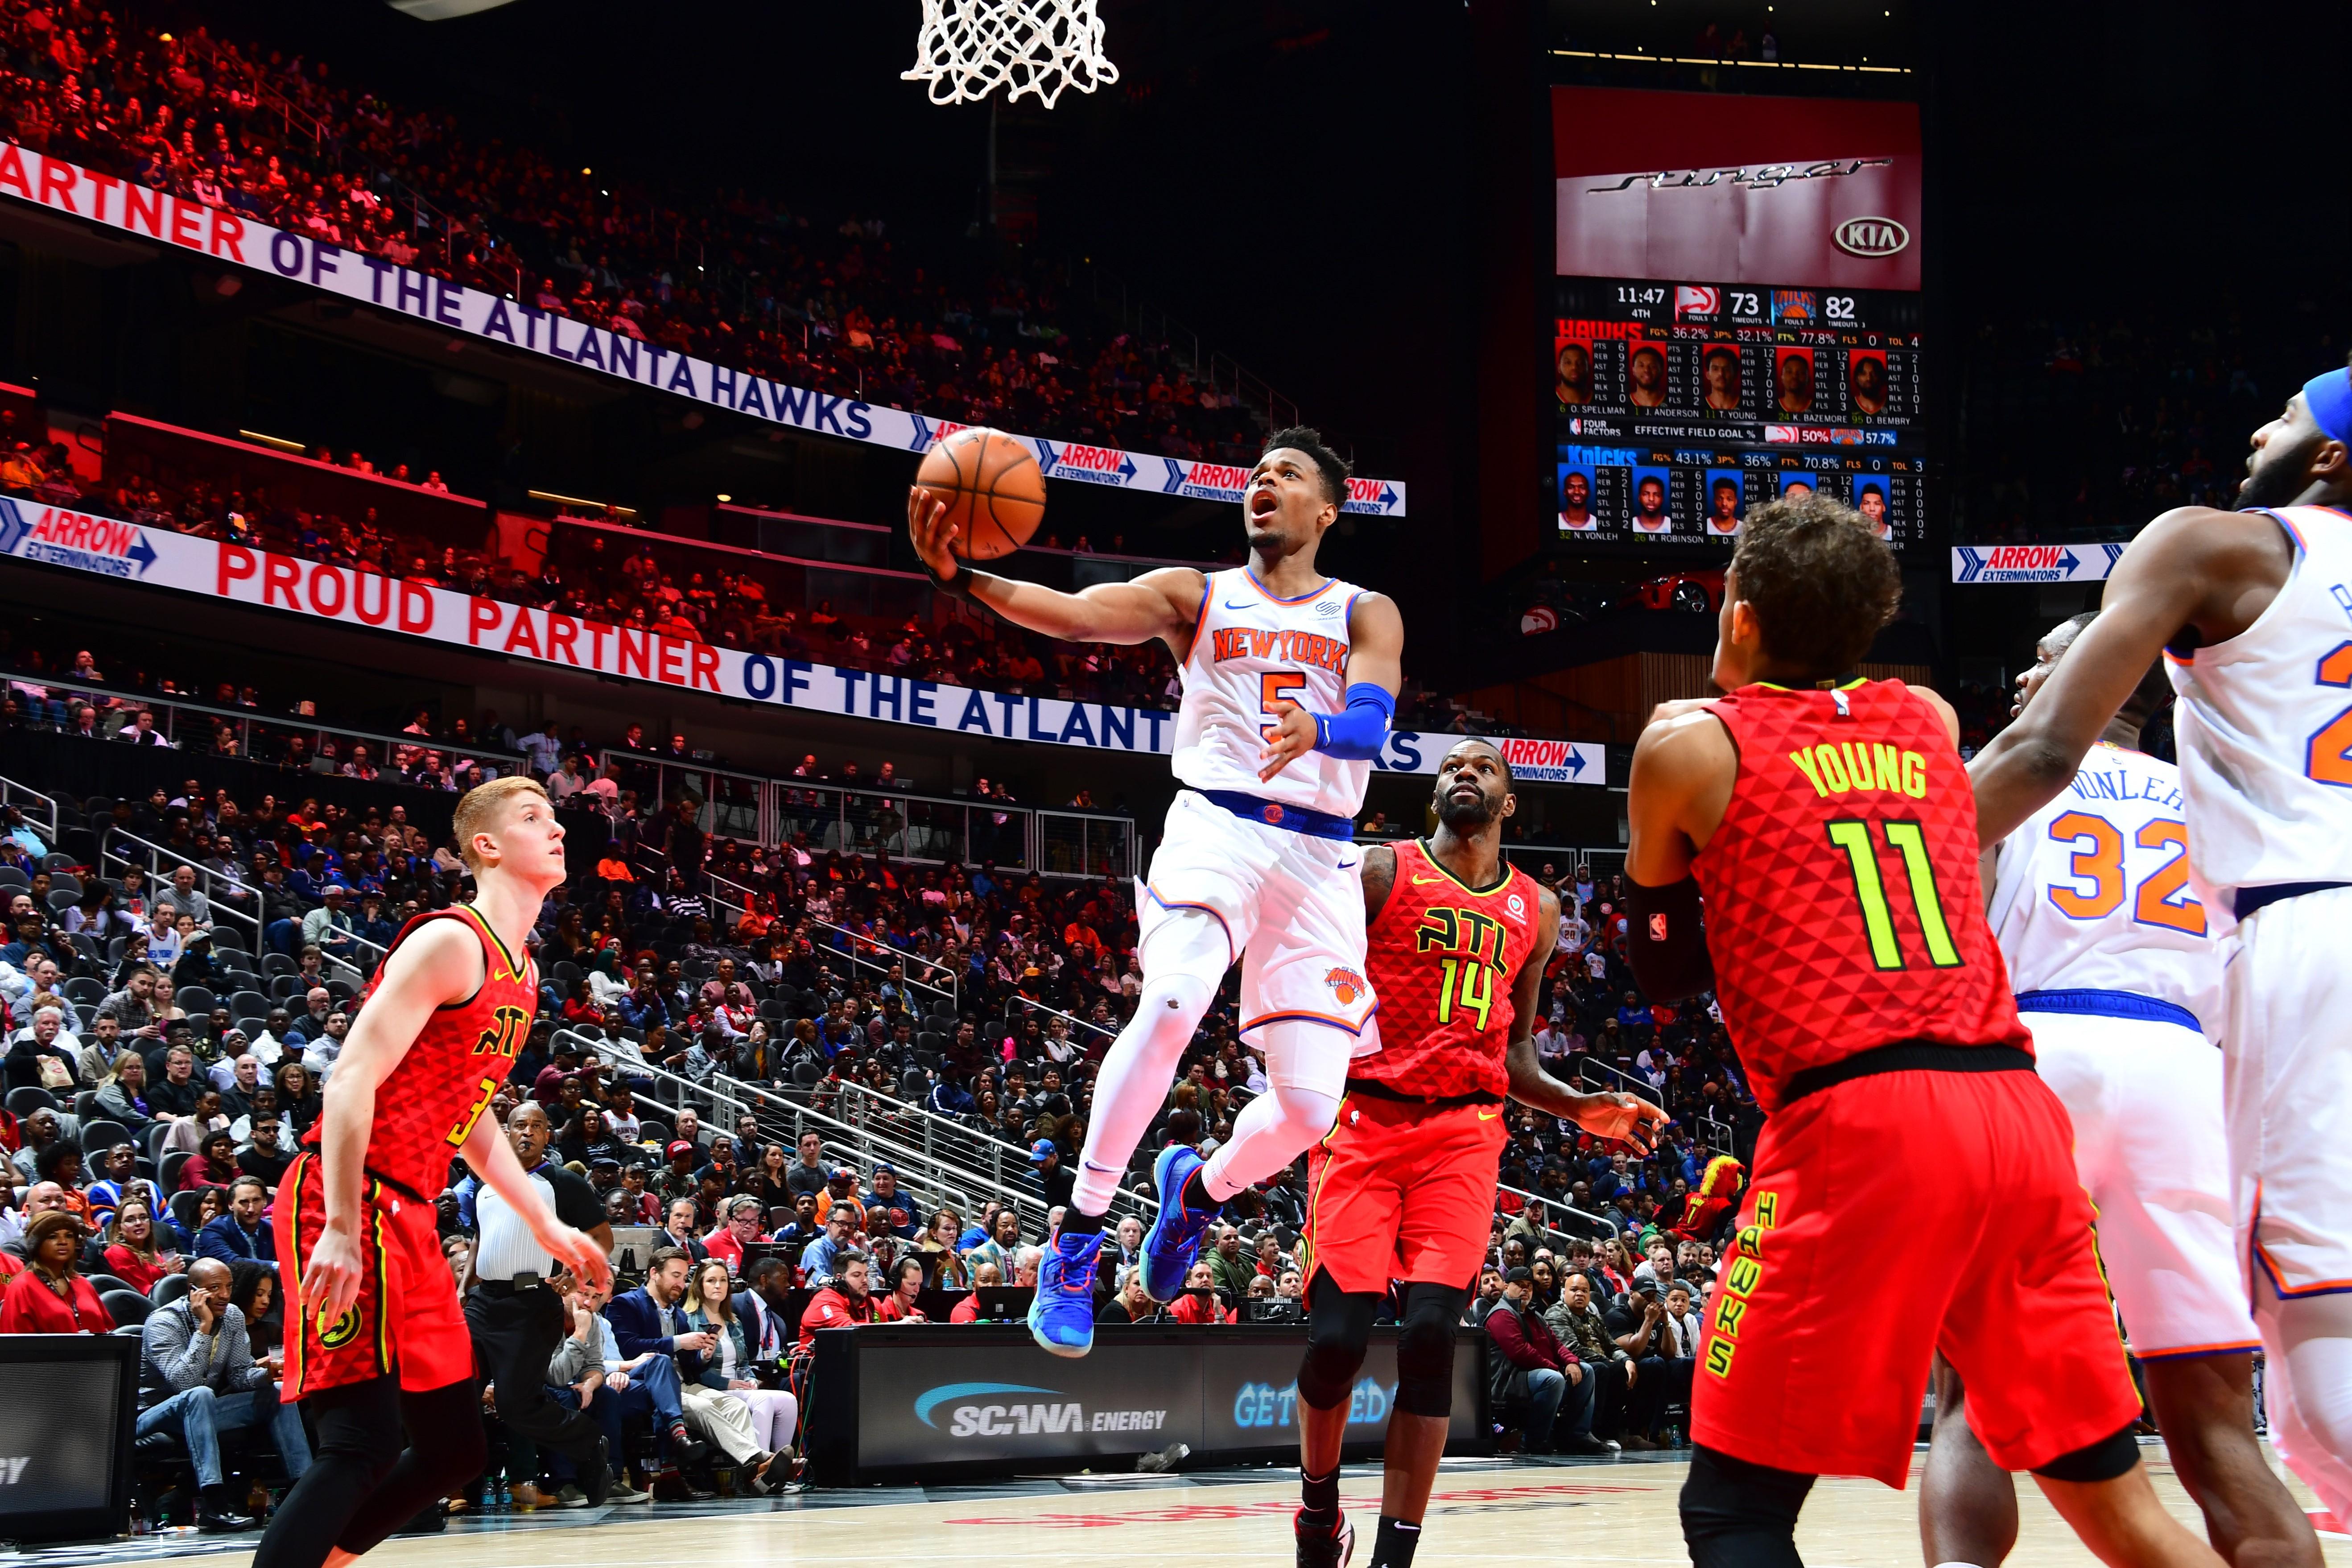 Dennis Smith lors de Atlanta Hawks - New York Knicks en NBA le 14 février 2019